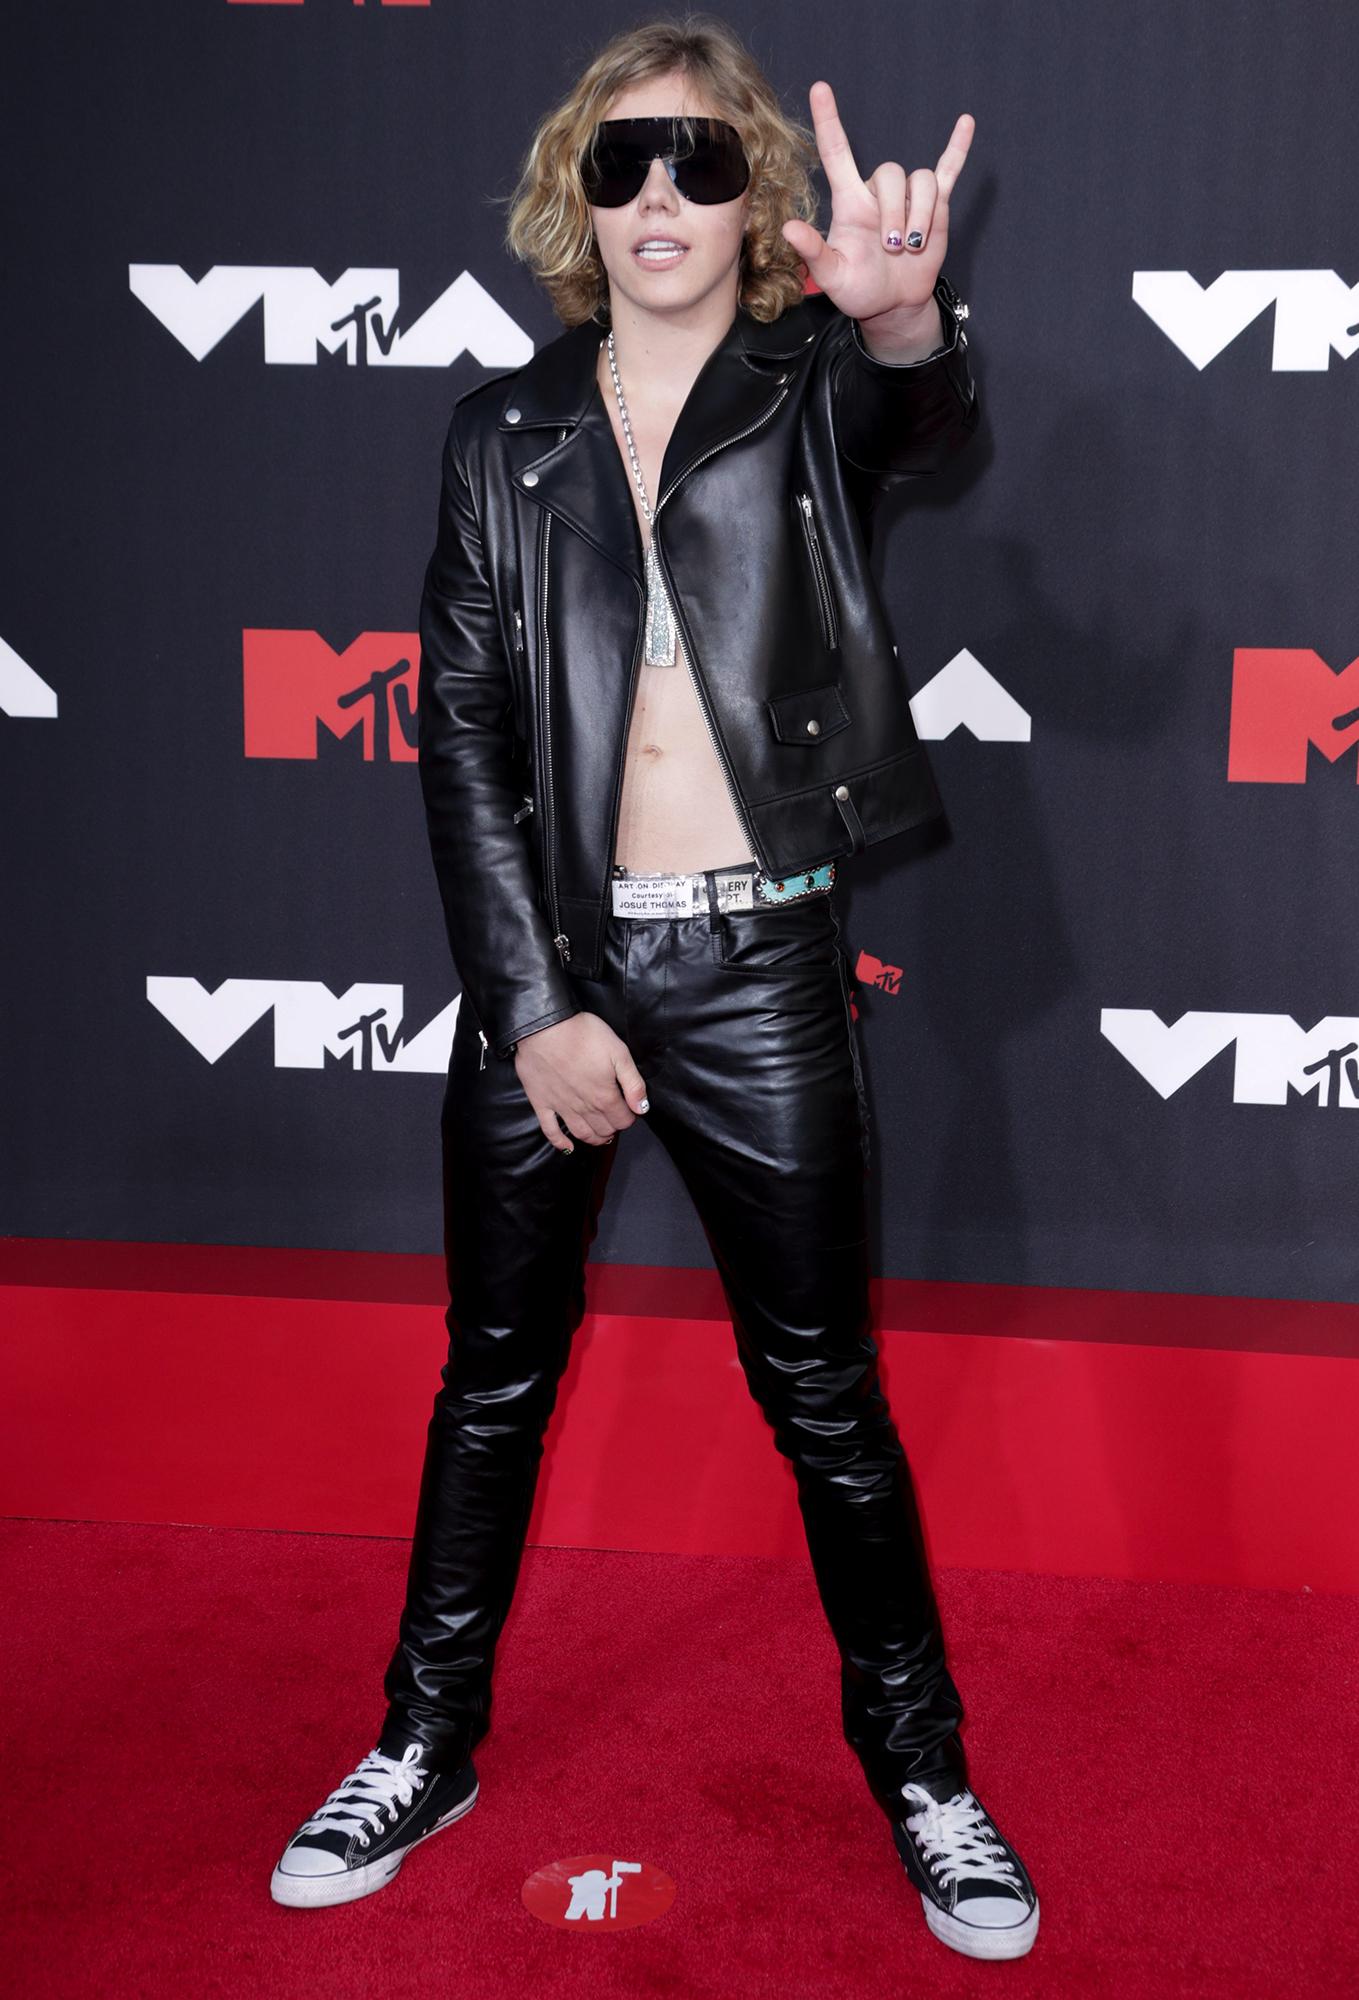 The Kid Laroi arrives at the 2012 MTV Video Music Awards